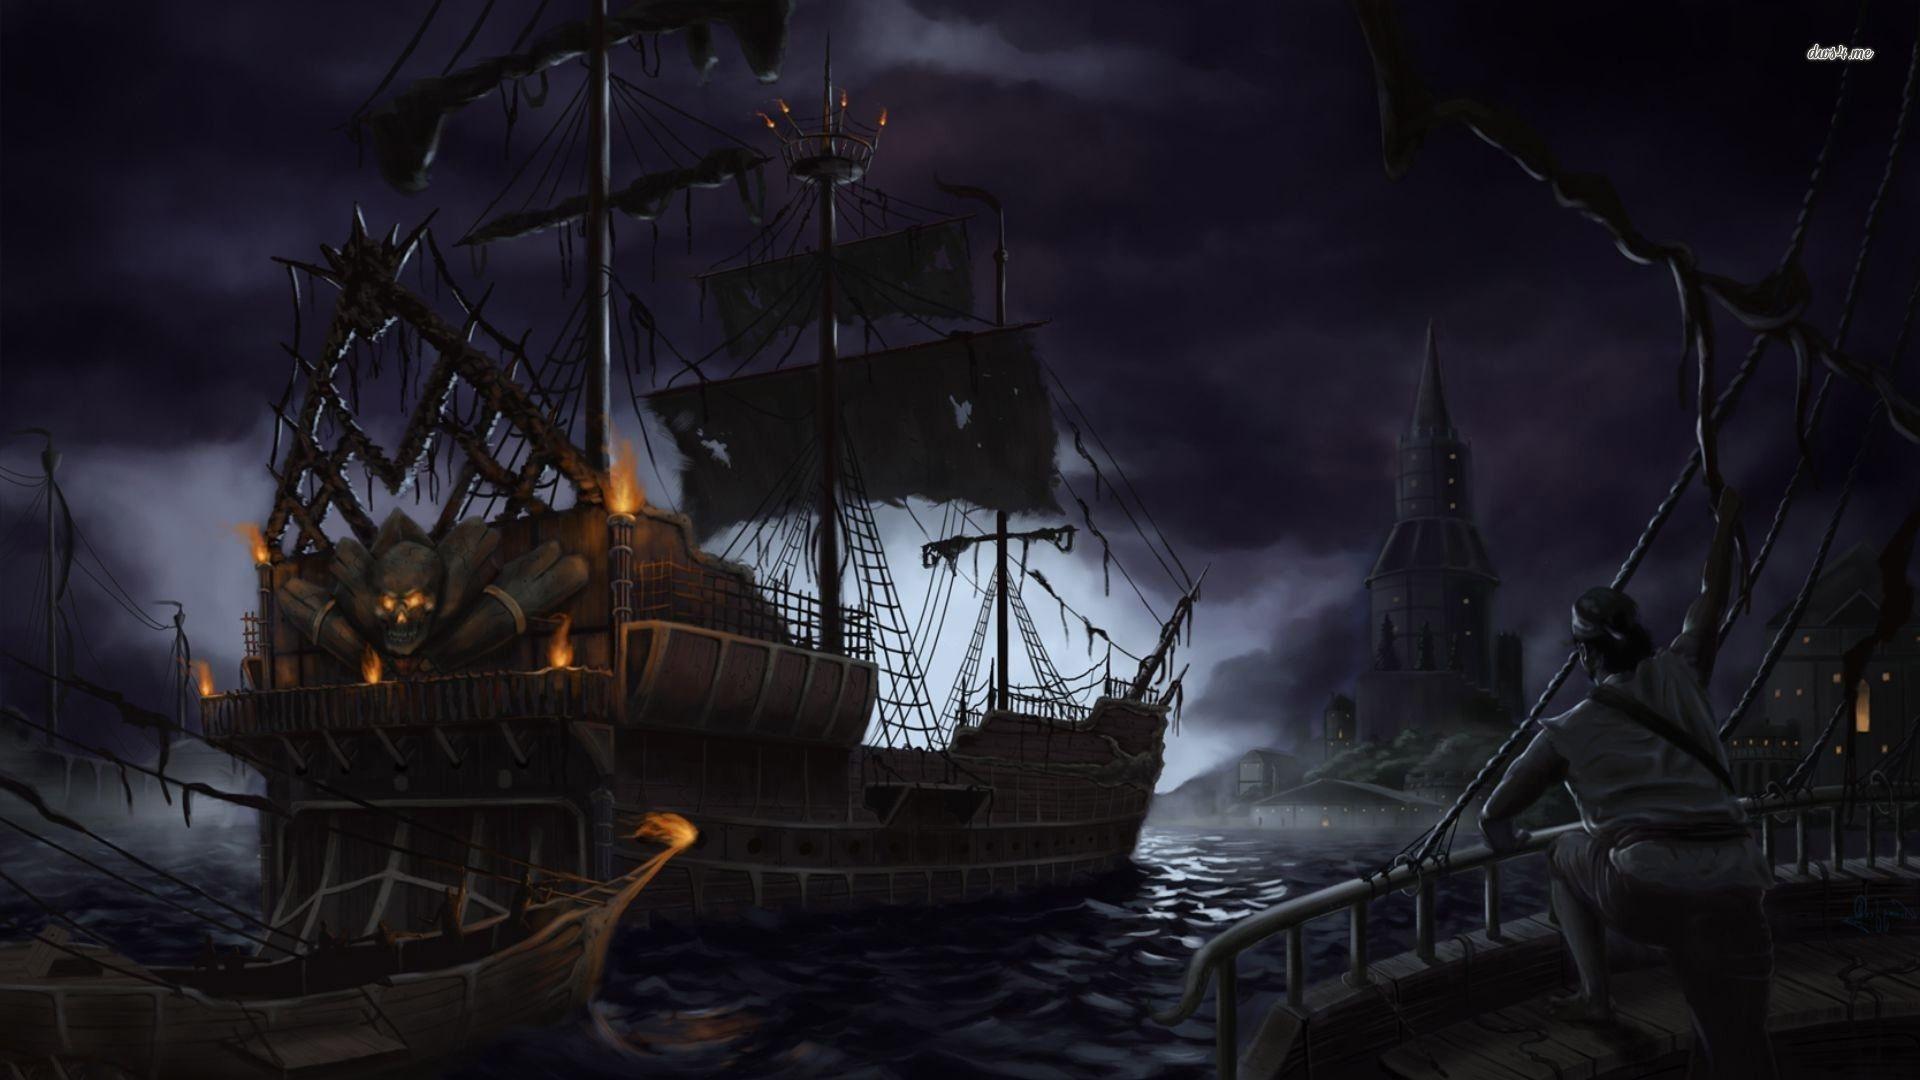 Pirate ship wallpaper – Fantasy wallpapers – #10855